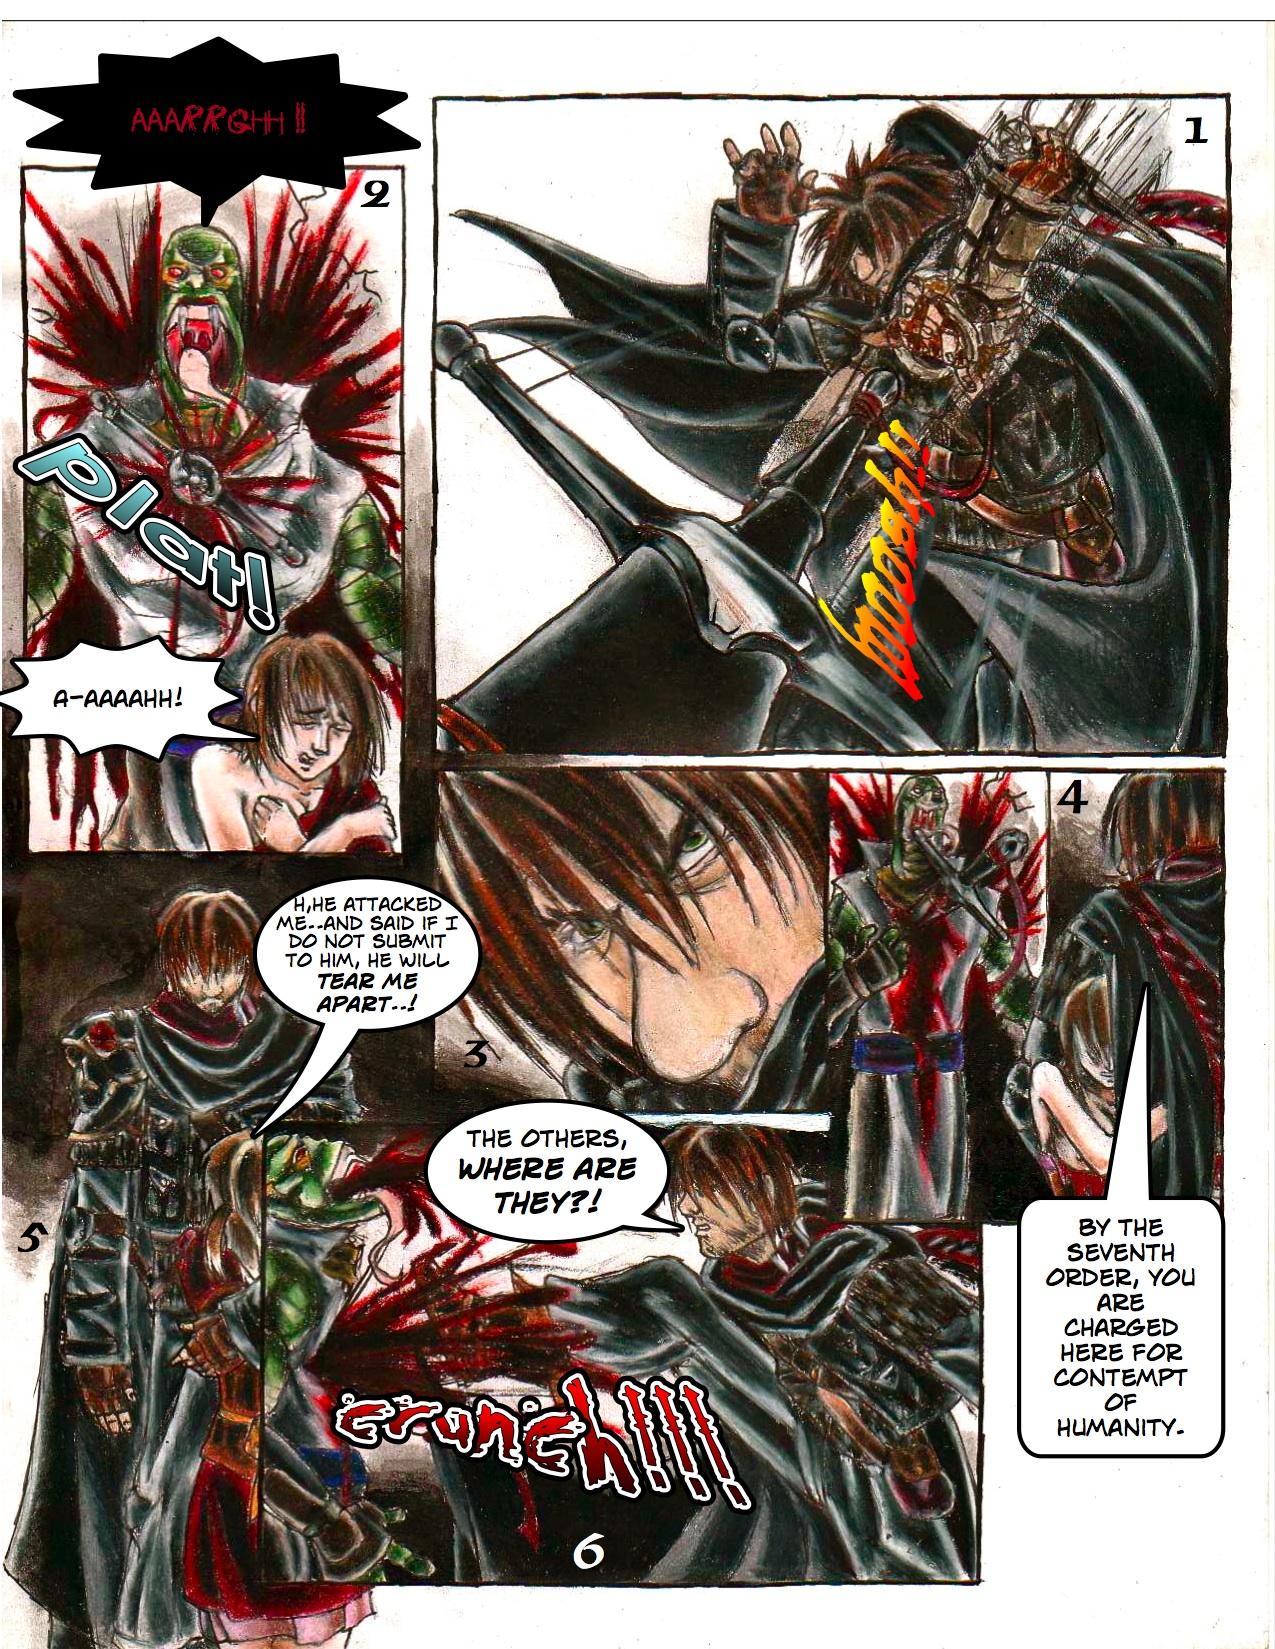 Myth page 3